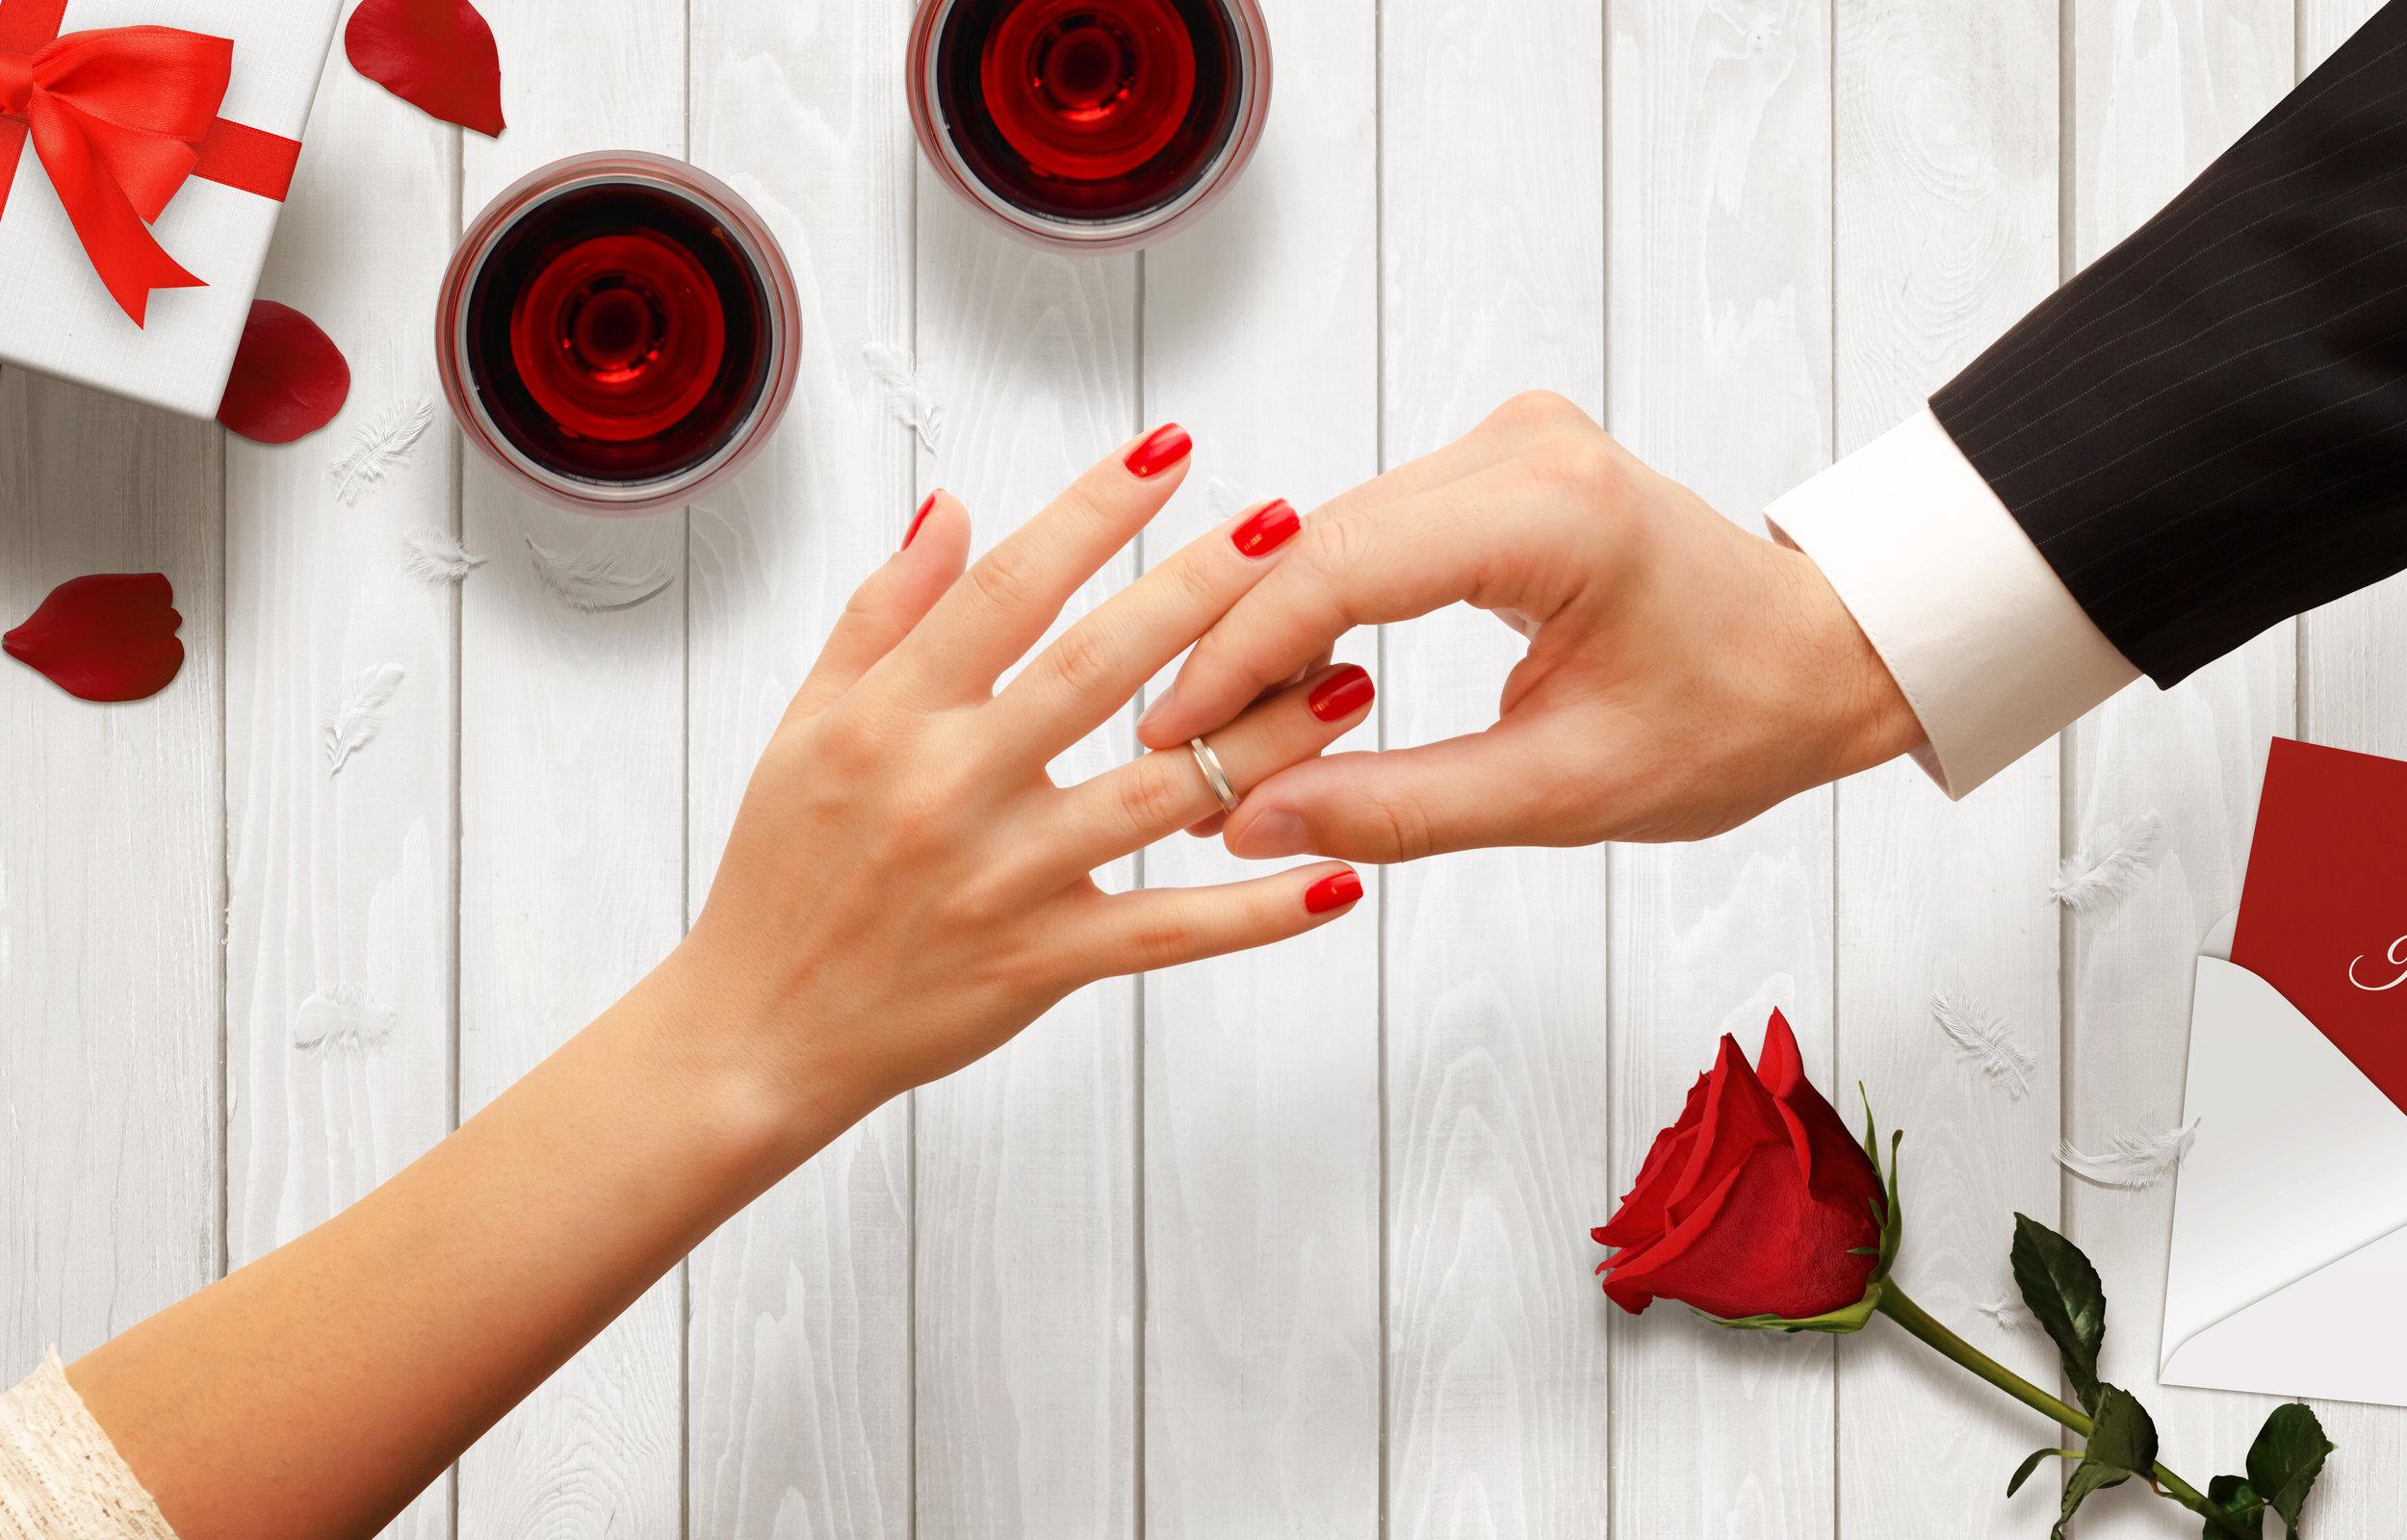 image-bridal proposal-shutterstock_366613448.jpg